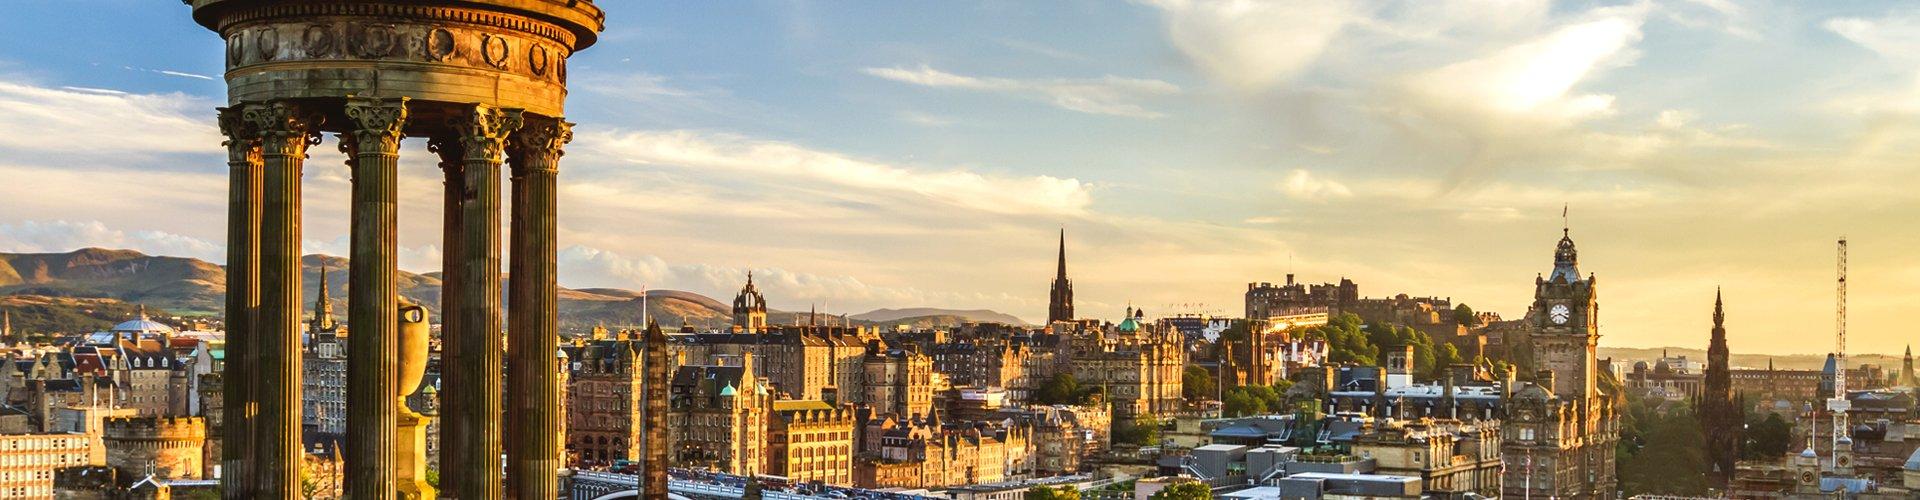 Edinburgh, Schotland, Groot-Brittannië